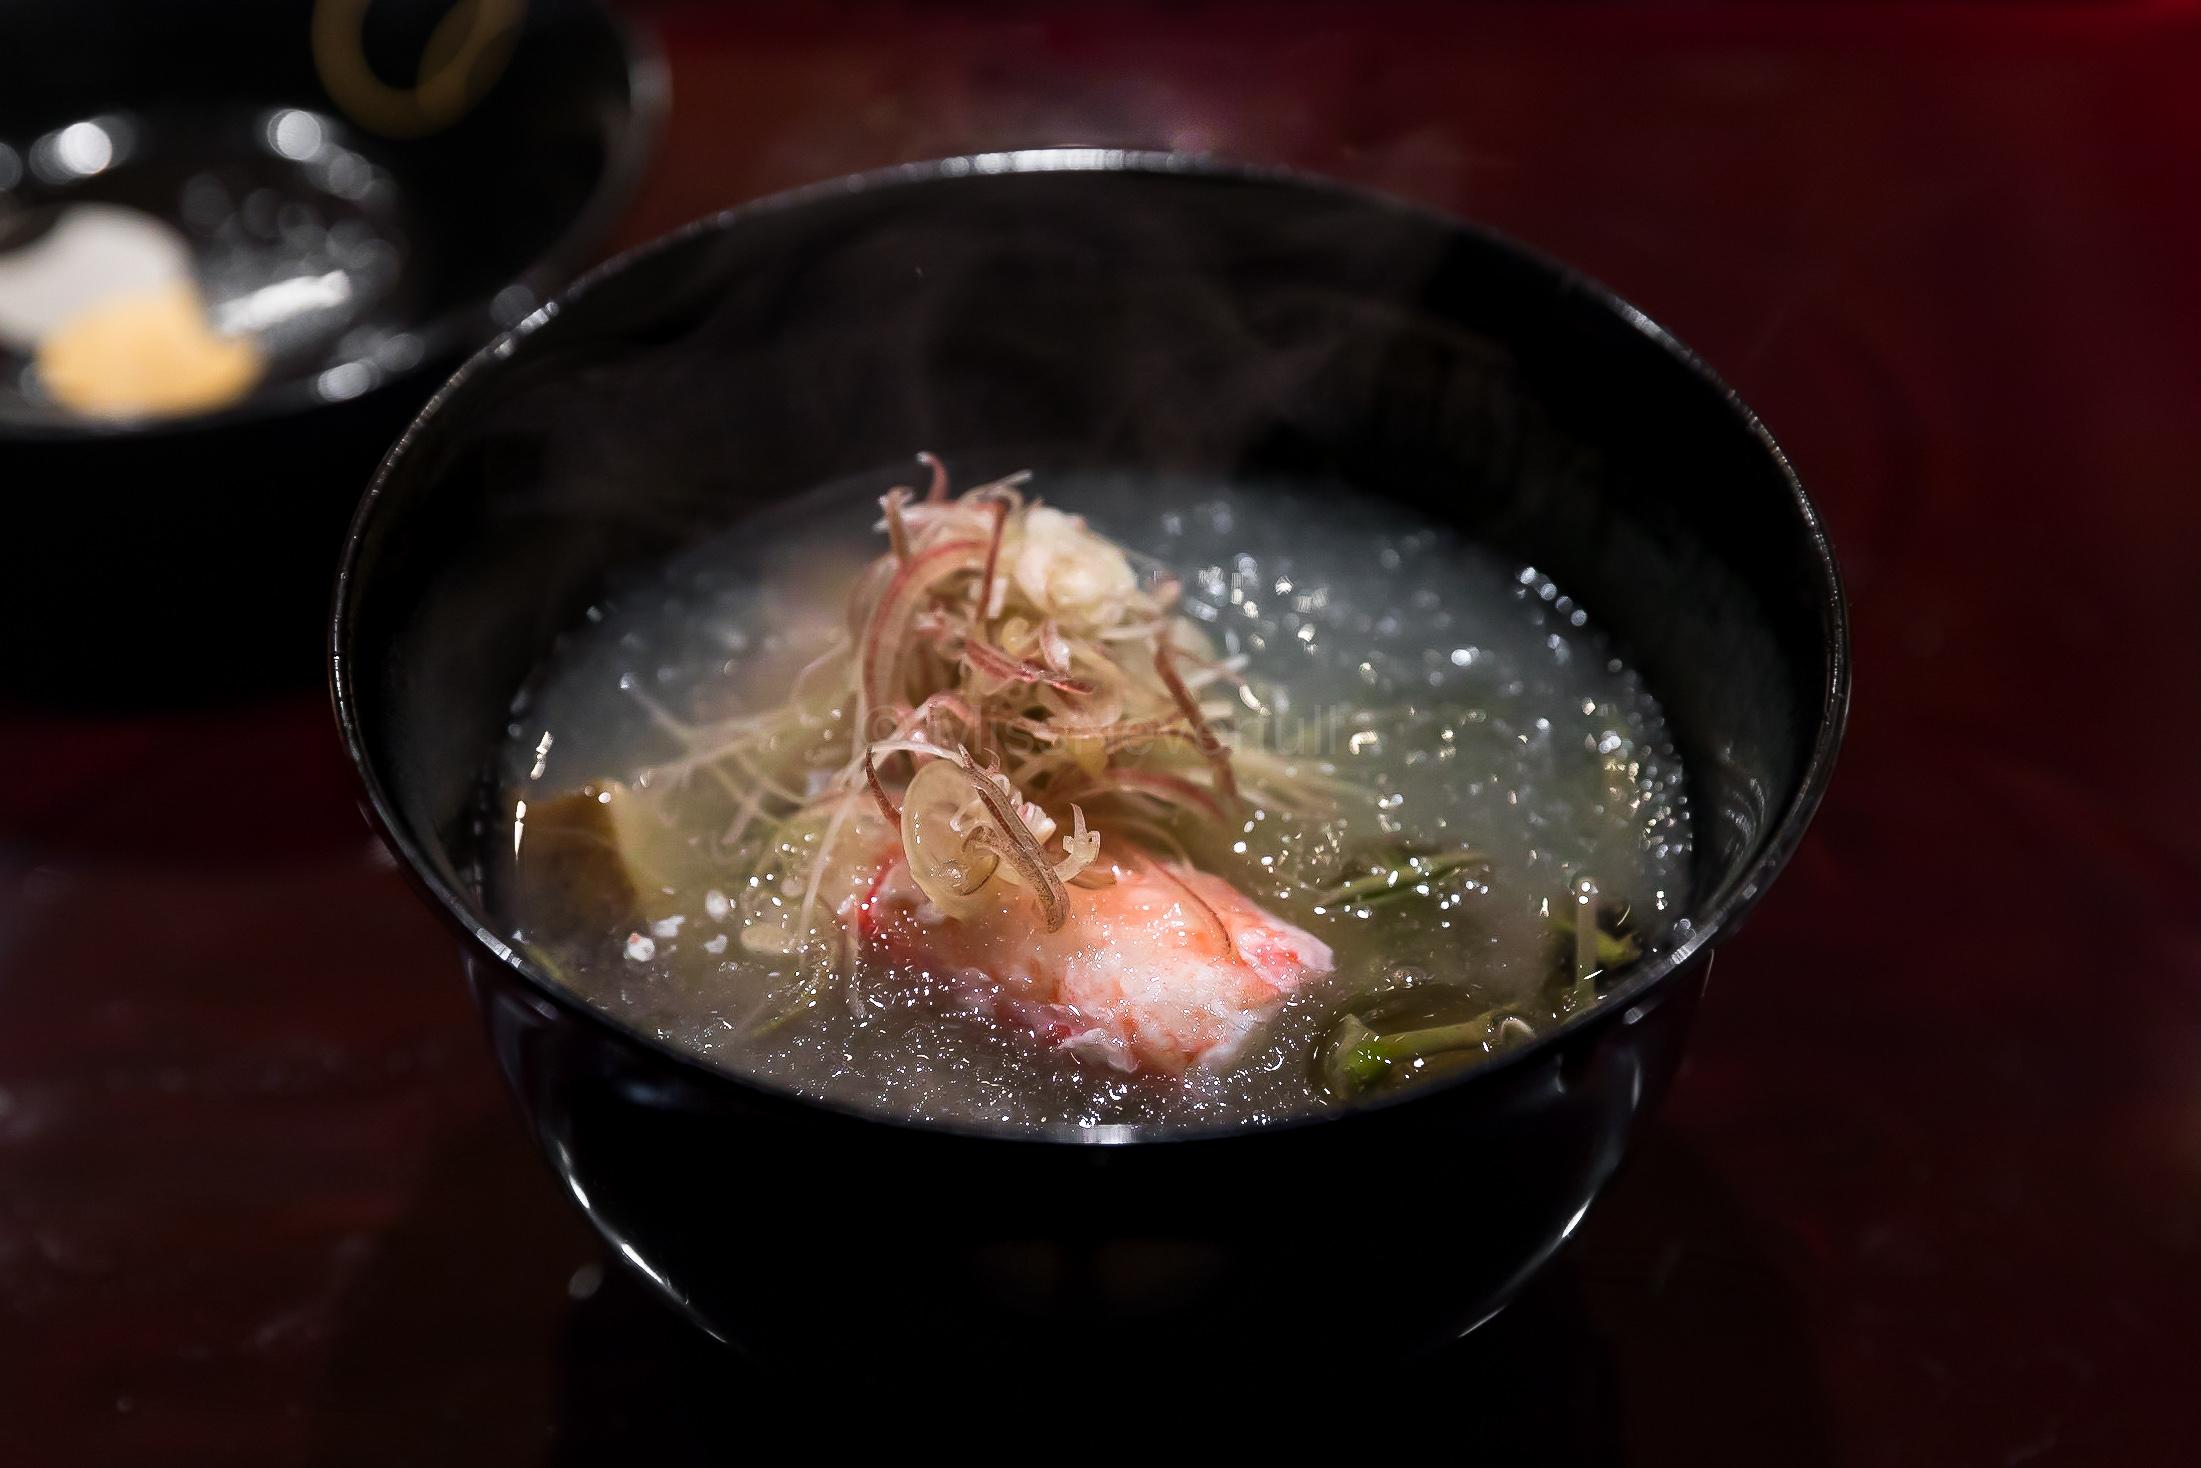 5. Awabi and kani 🦀️ soup with junsai (water shield) | 鮑と蟹のお椀